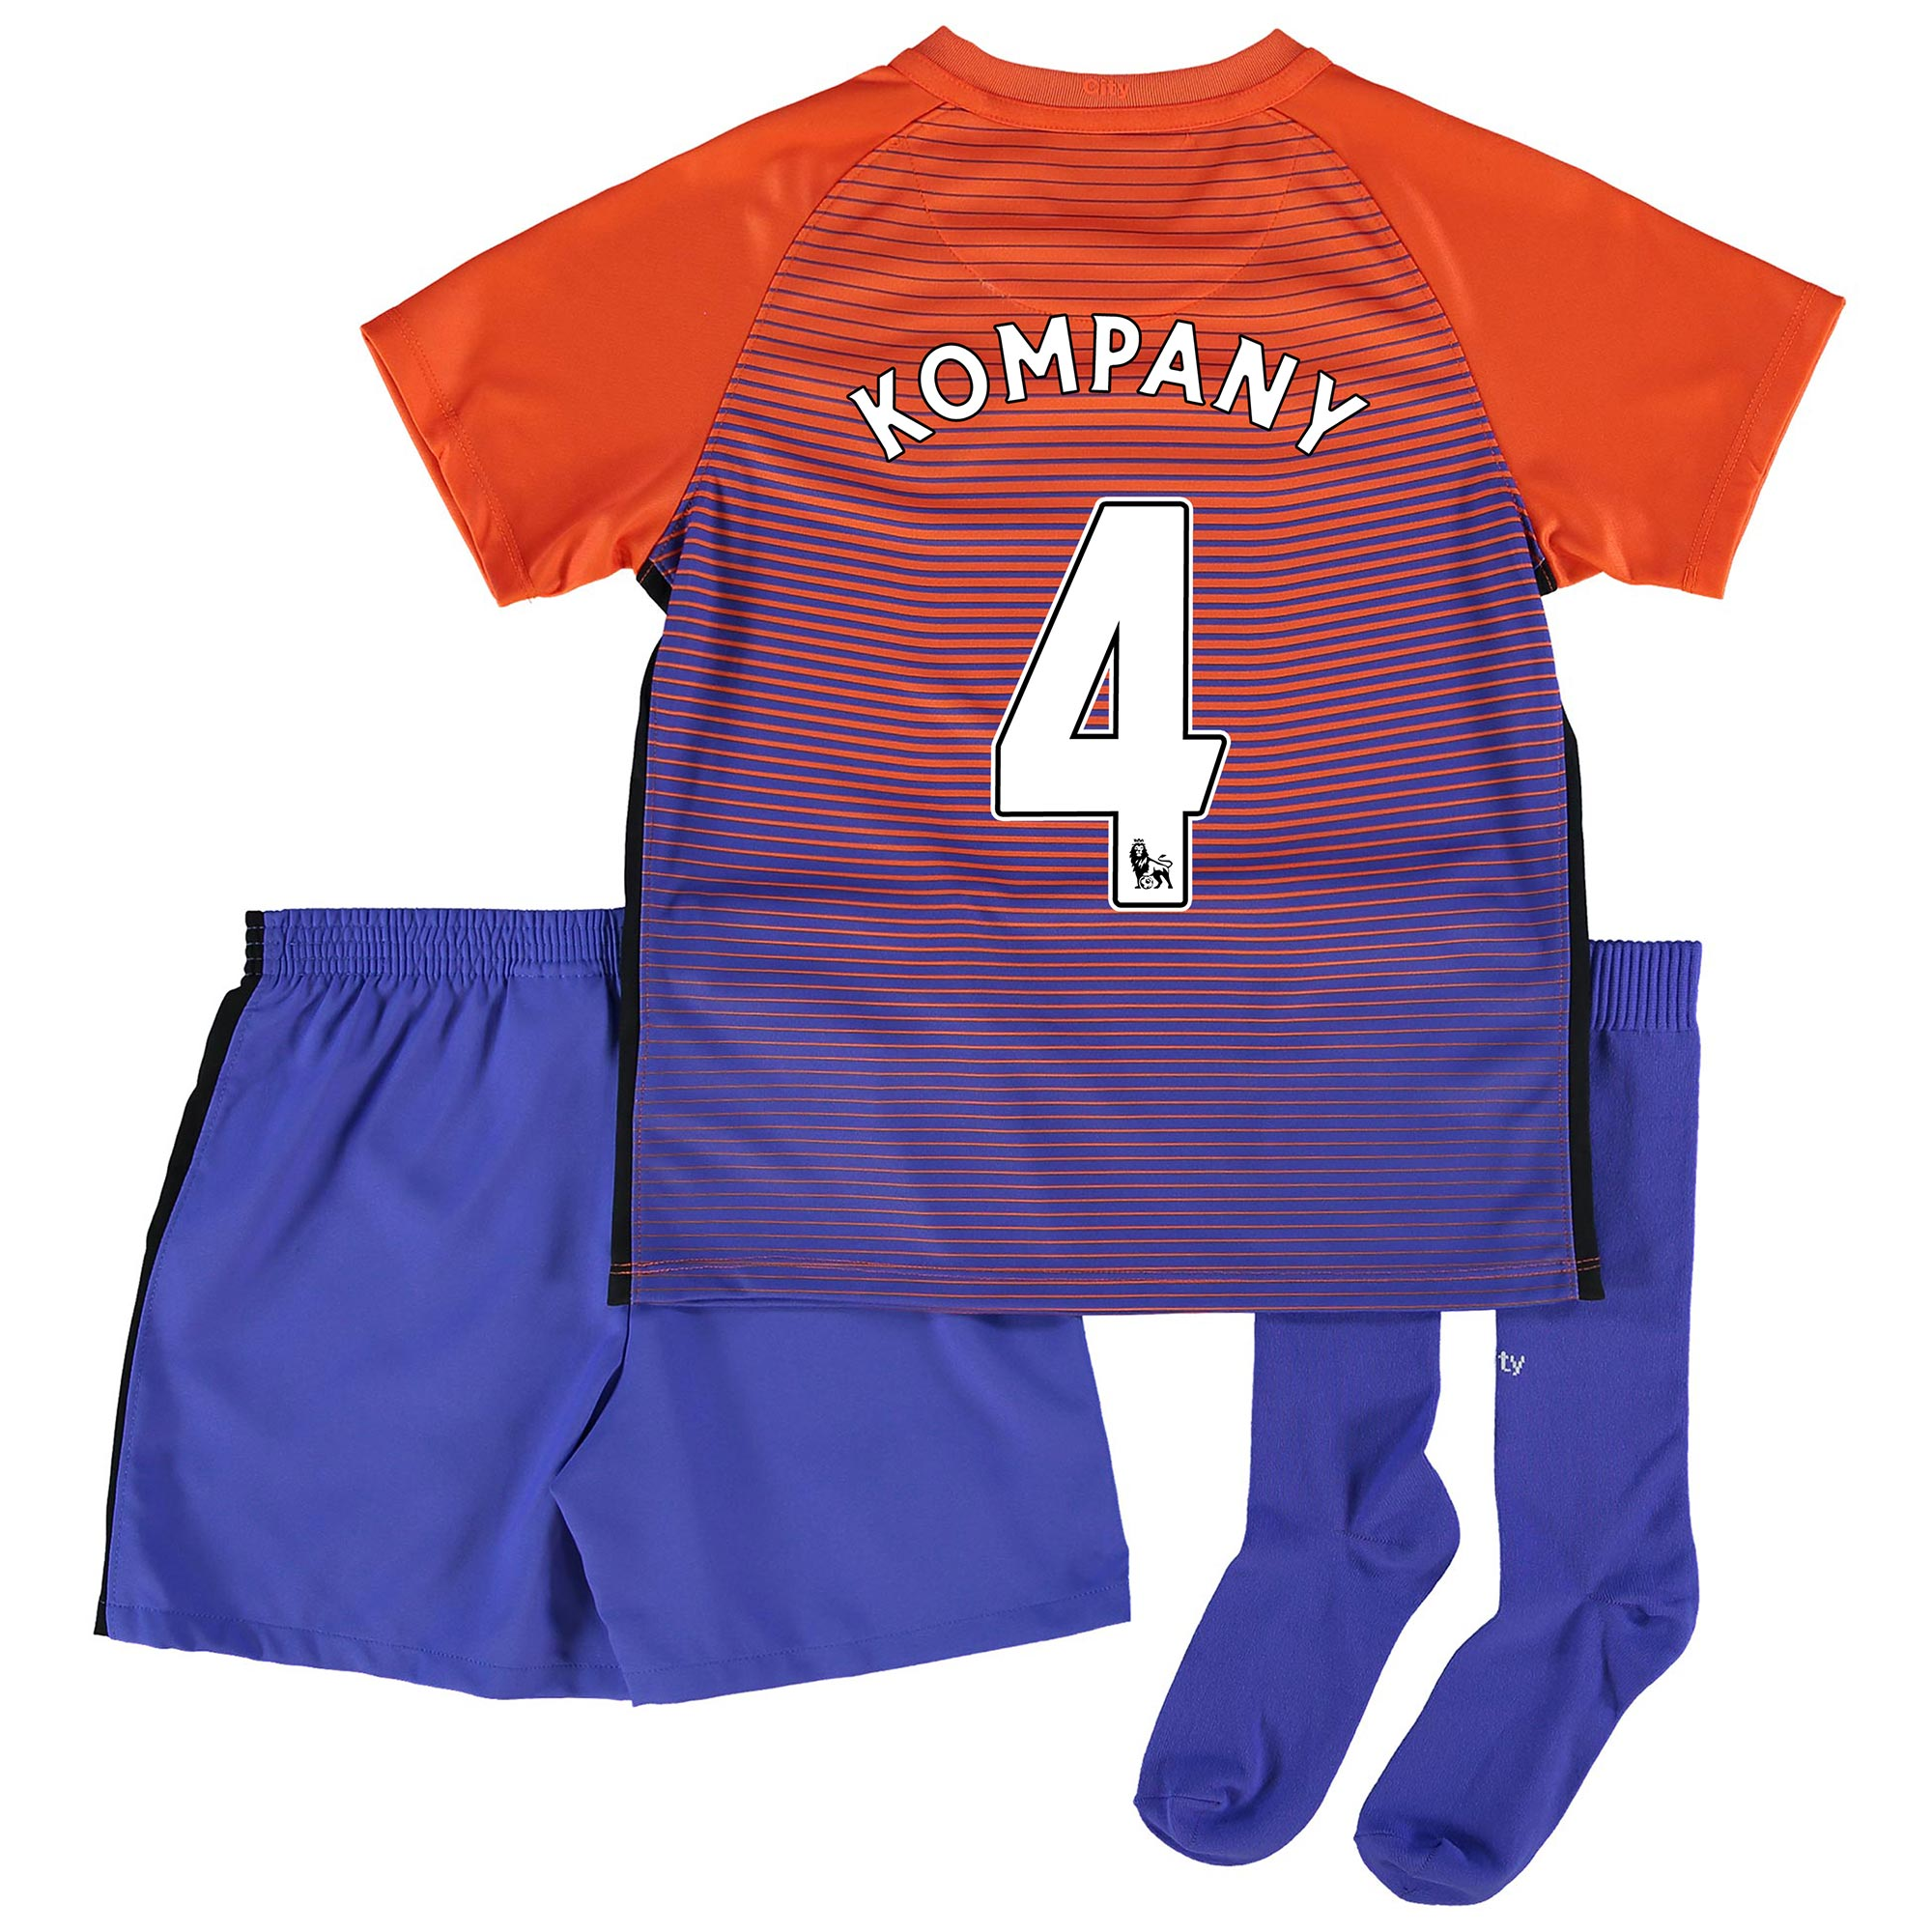 Manchester City Third Stadium Kit 2016-17 - Little Kids with Kompany 4